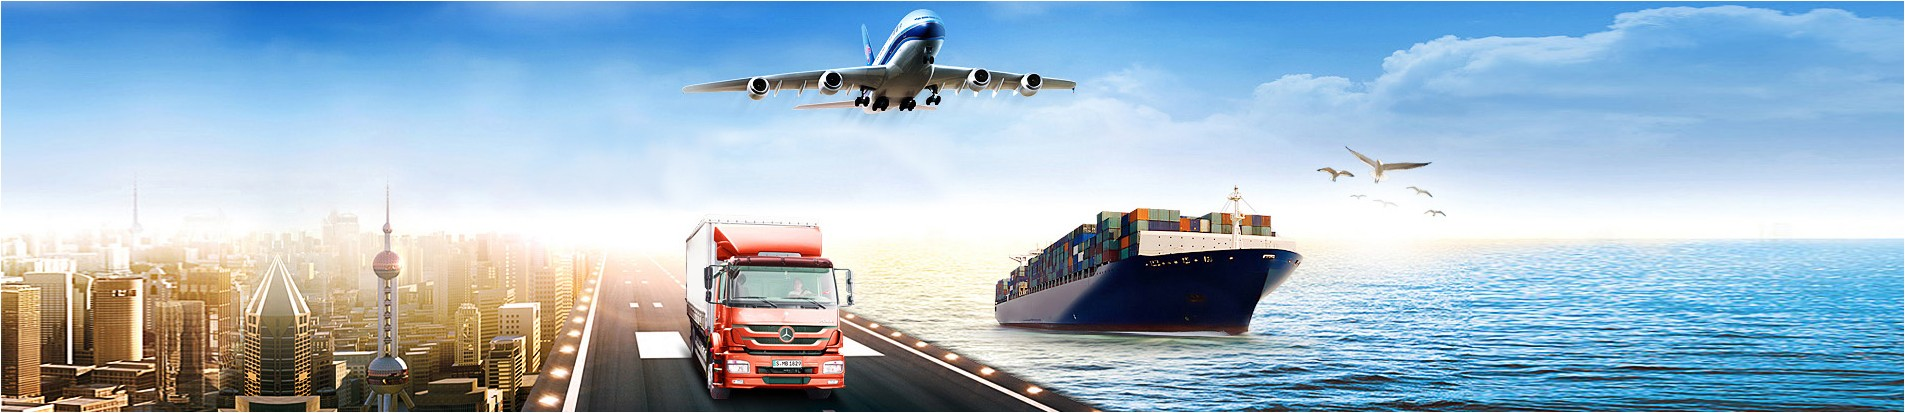 Talks to get FedEx, Expo Freight hubs at BIA 1546422396889?e=2159024400&v=beta&t=NTOIdhRiSUsYlOw-7BYGJWyygo_nr-l6hCfVPVGRpBM